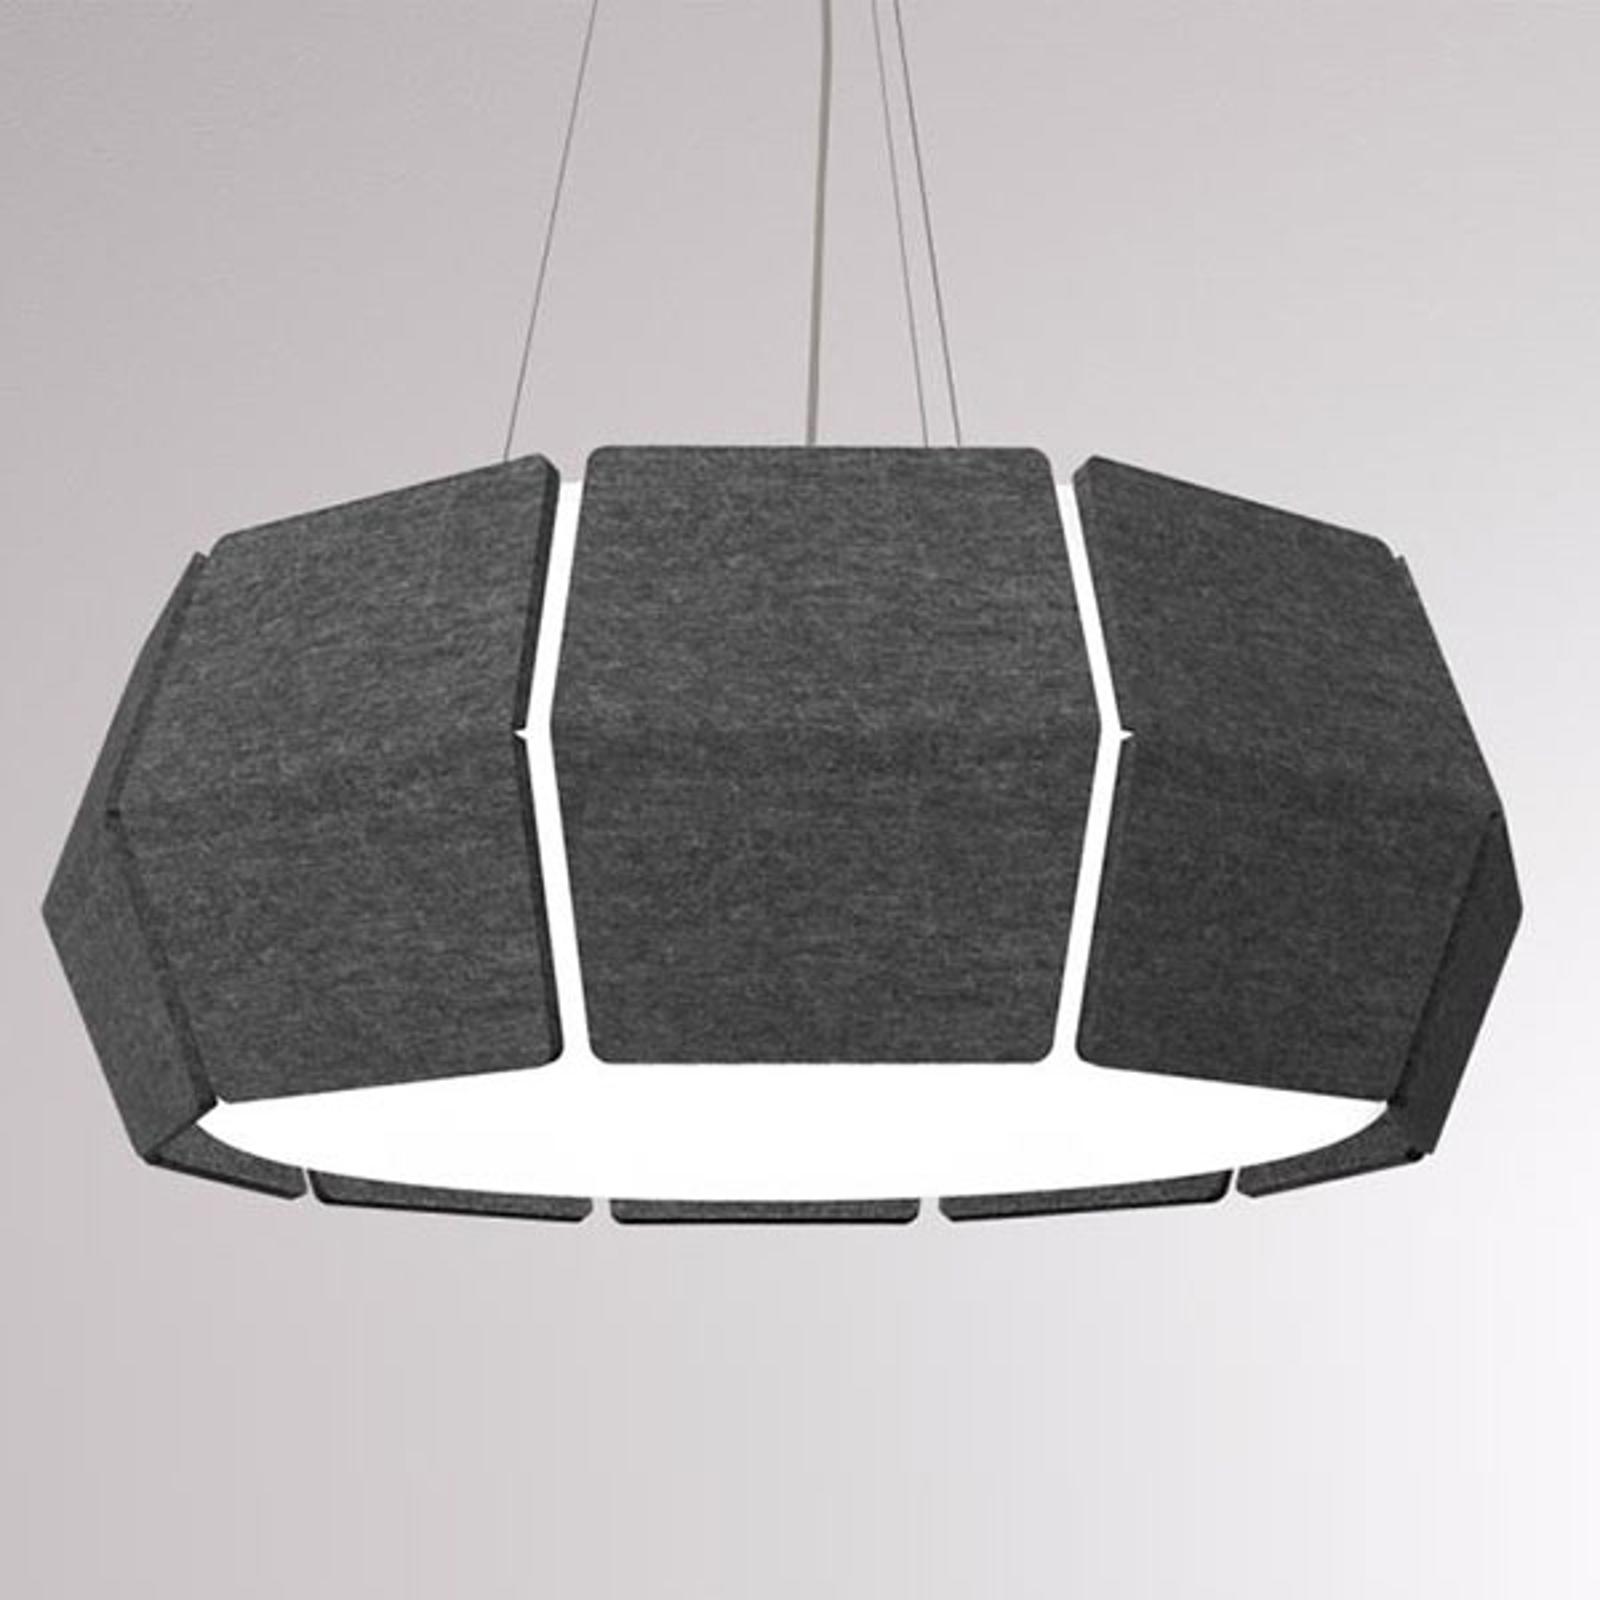 LOUM Decafelt LED hanglamp zwart Ø 76 cm